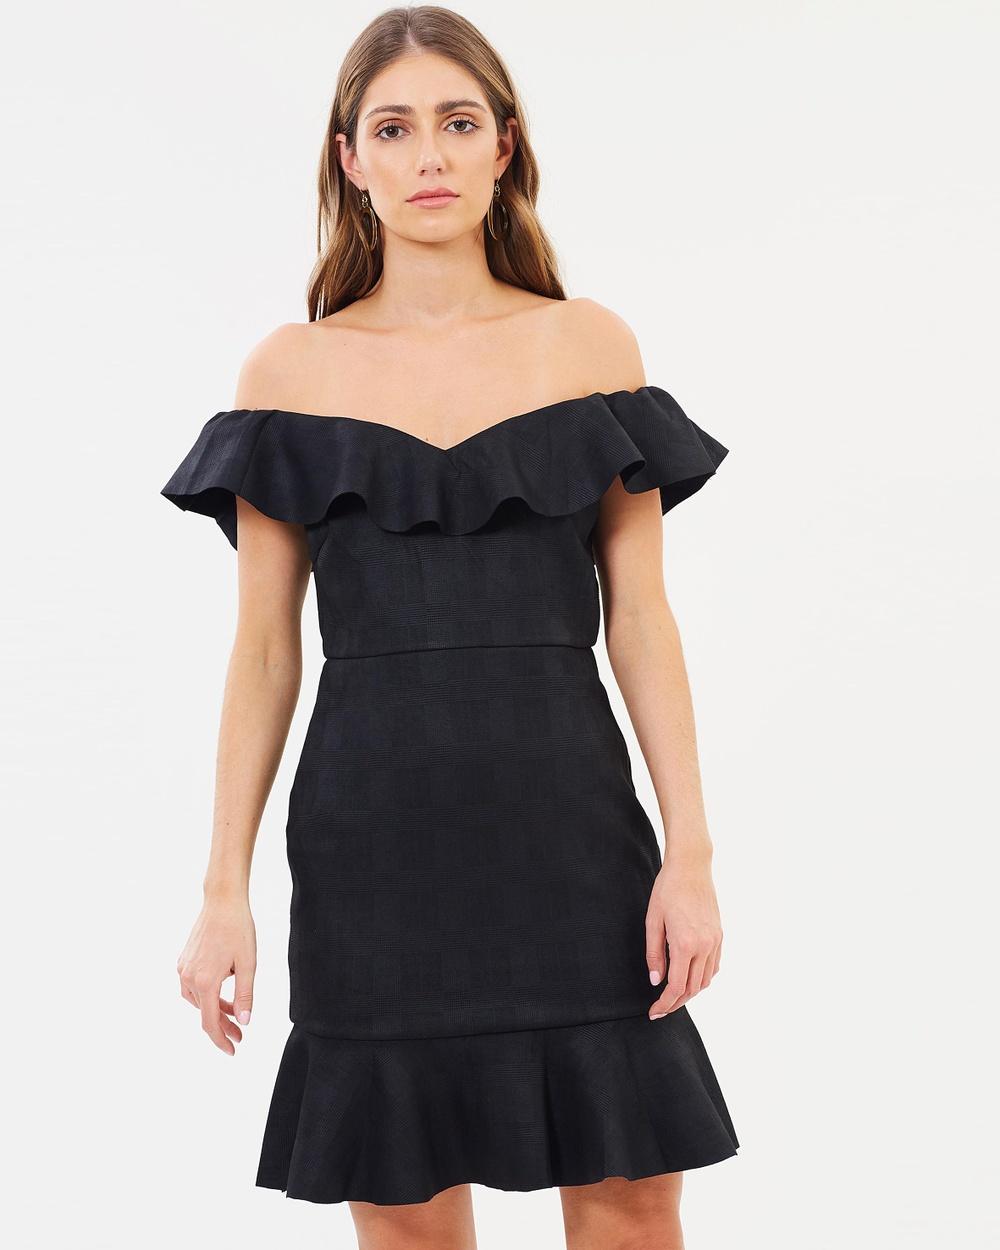 Fresh Soul Veronica Dress Bodycon Dresses Black Check Veronica Dress